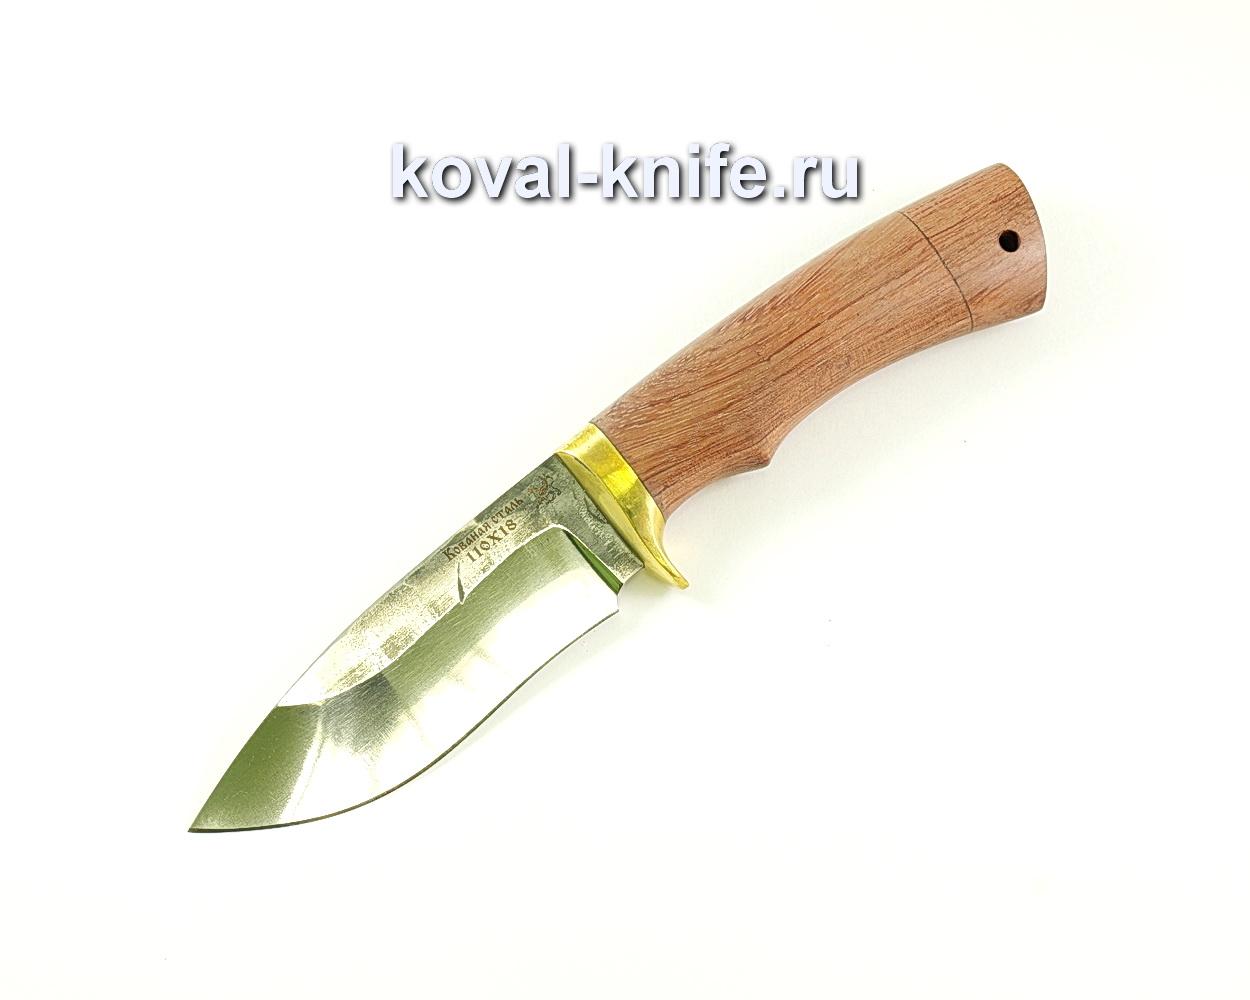 Нож Сапсан (сталь 110х18), рукоять бубинга, литье A033